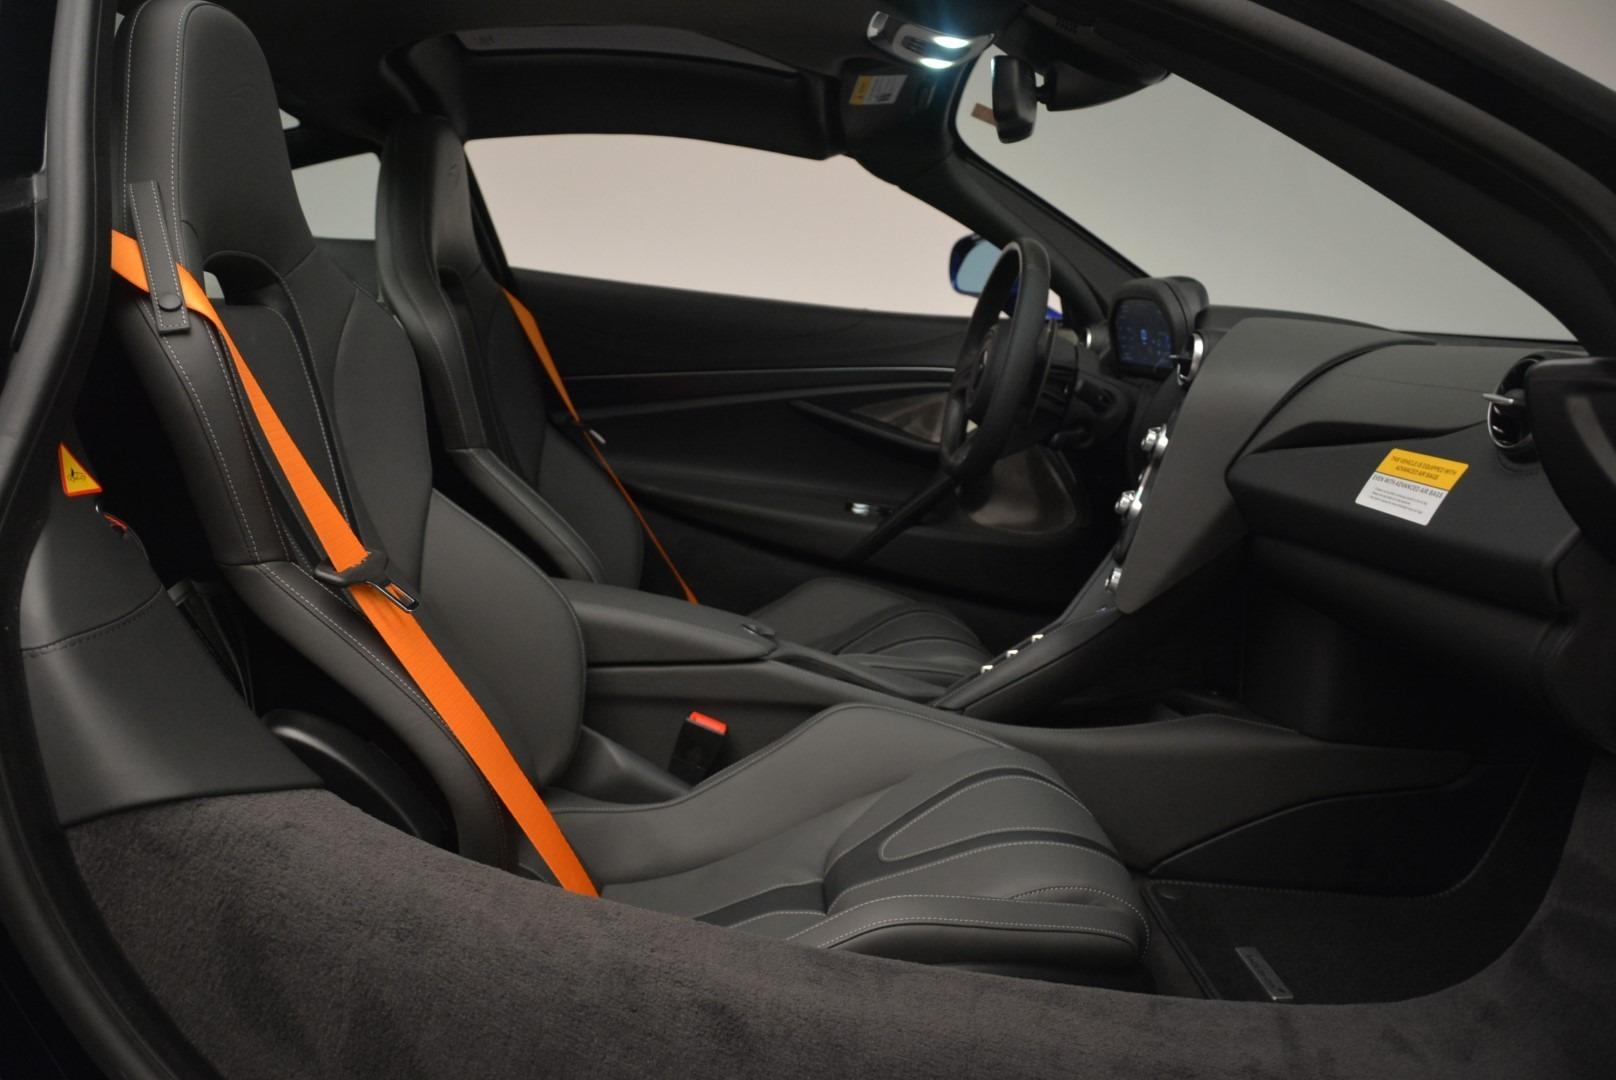 Used 2019 McLaren 720S Coupe For Sale In Westport, CT 2516_p20